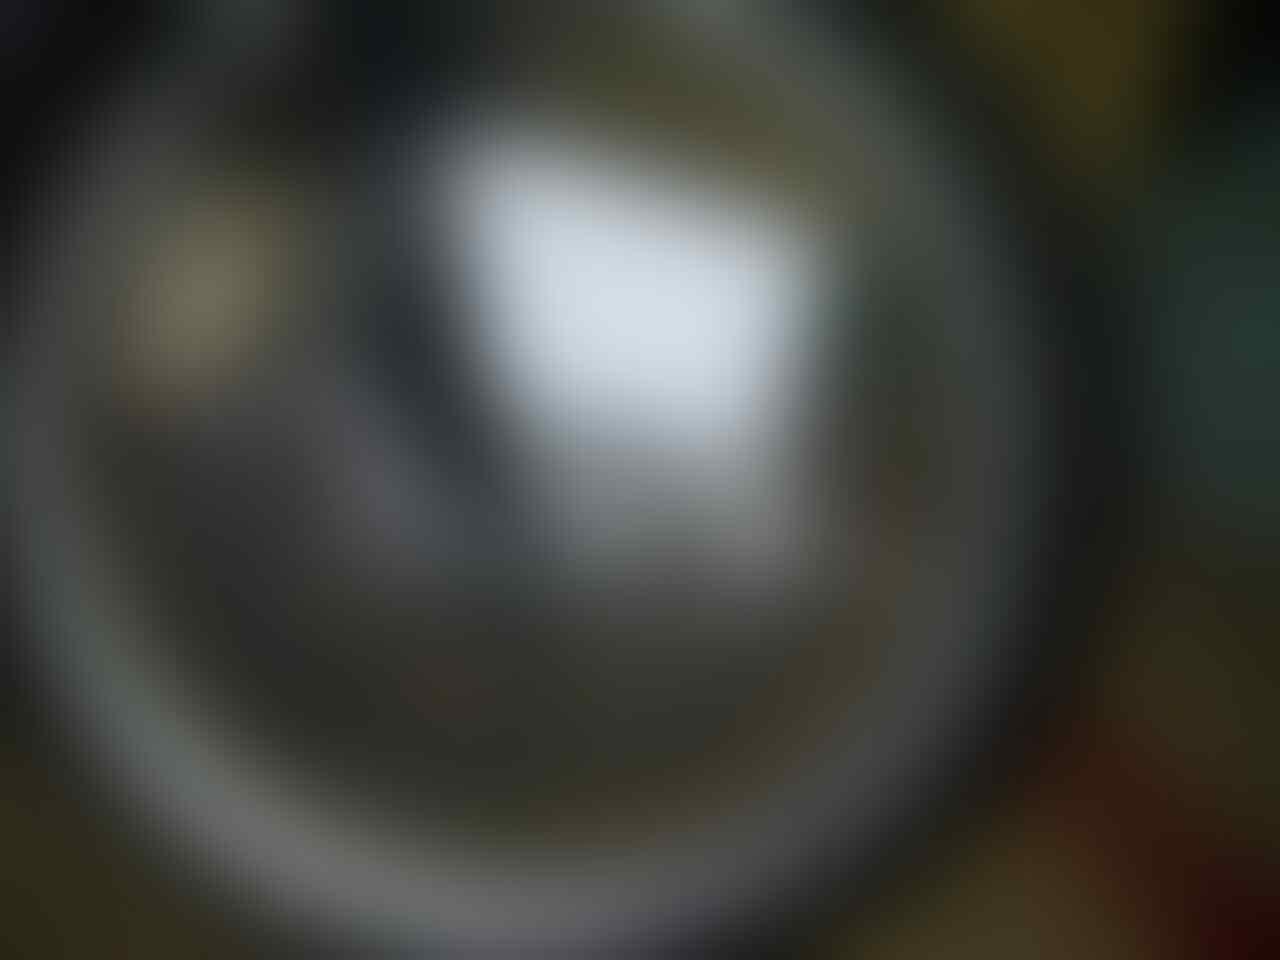 Piringan Cakram KLX150/DT150 DER